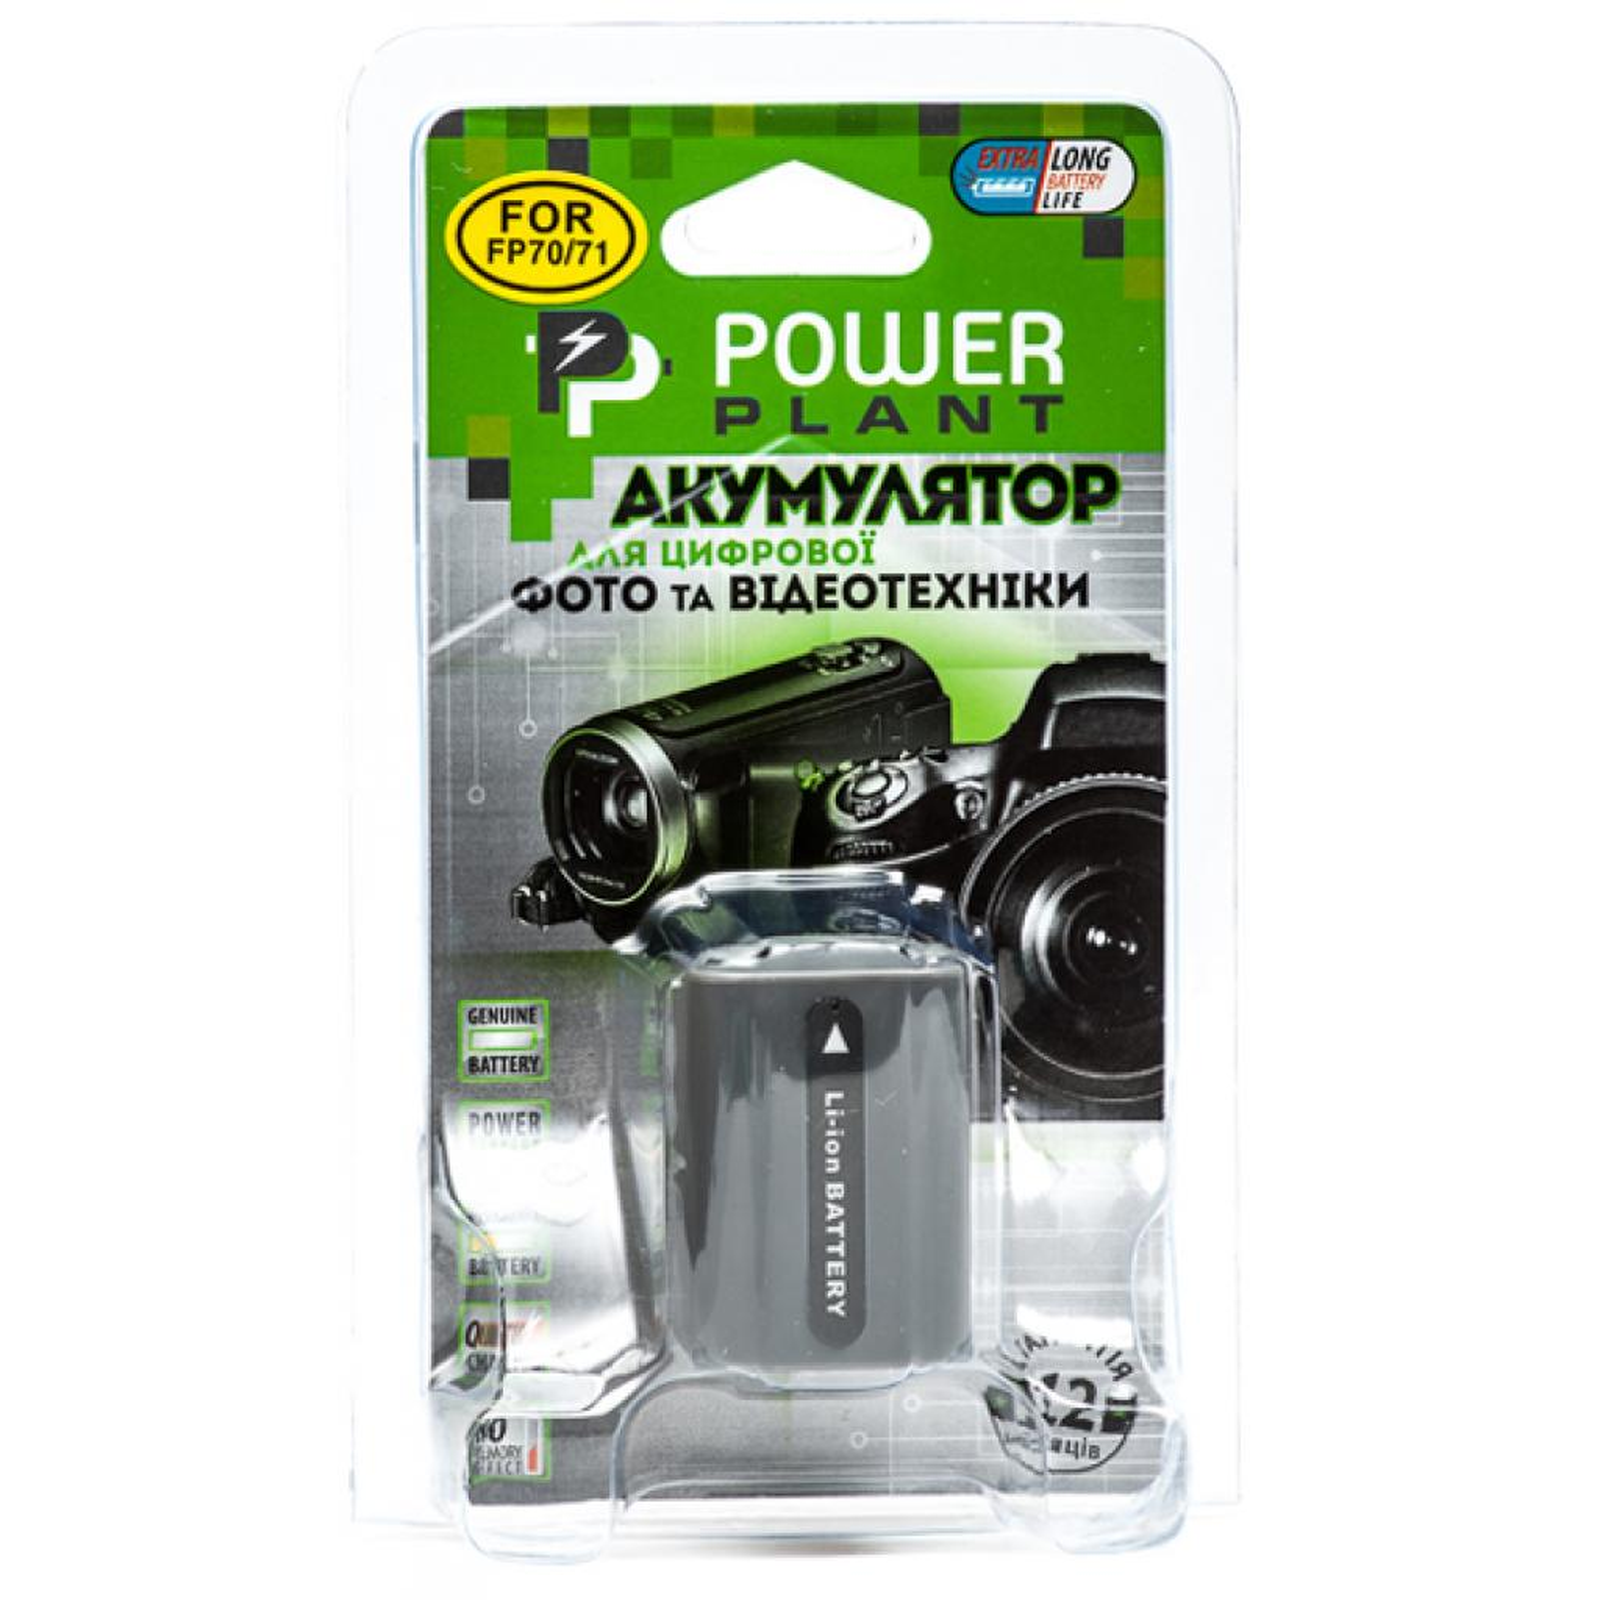 Аккумулятор к фото/видео PowerPlant Sony NP-FP70 (DV00DV1026) изображение 3